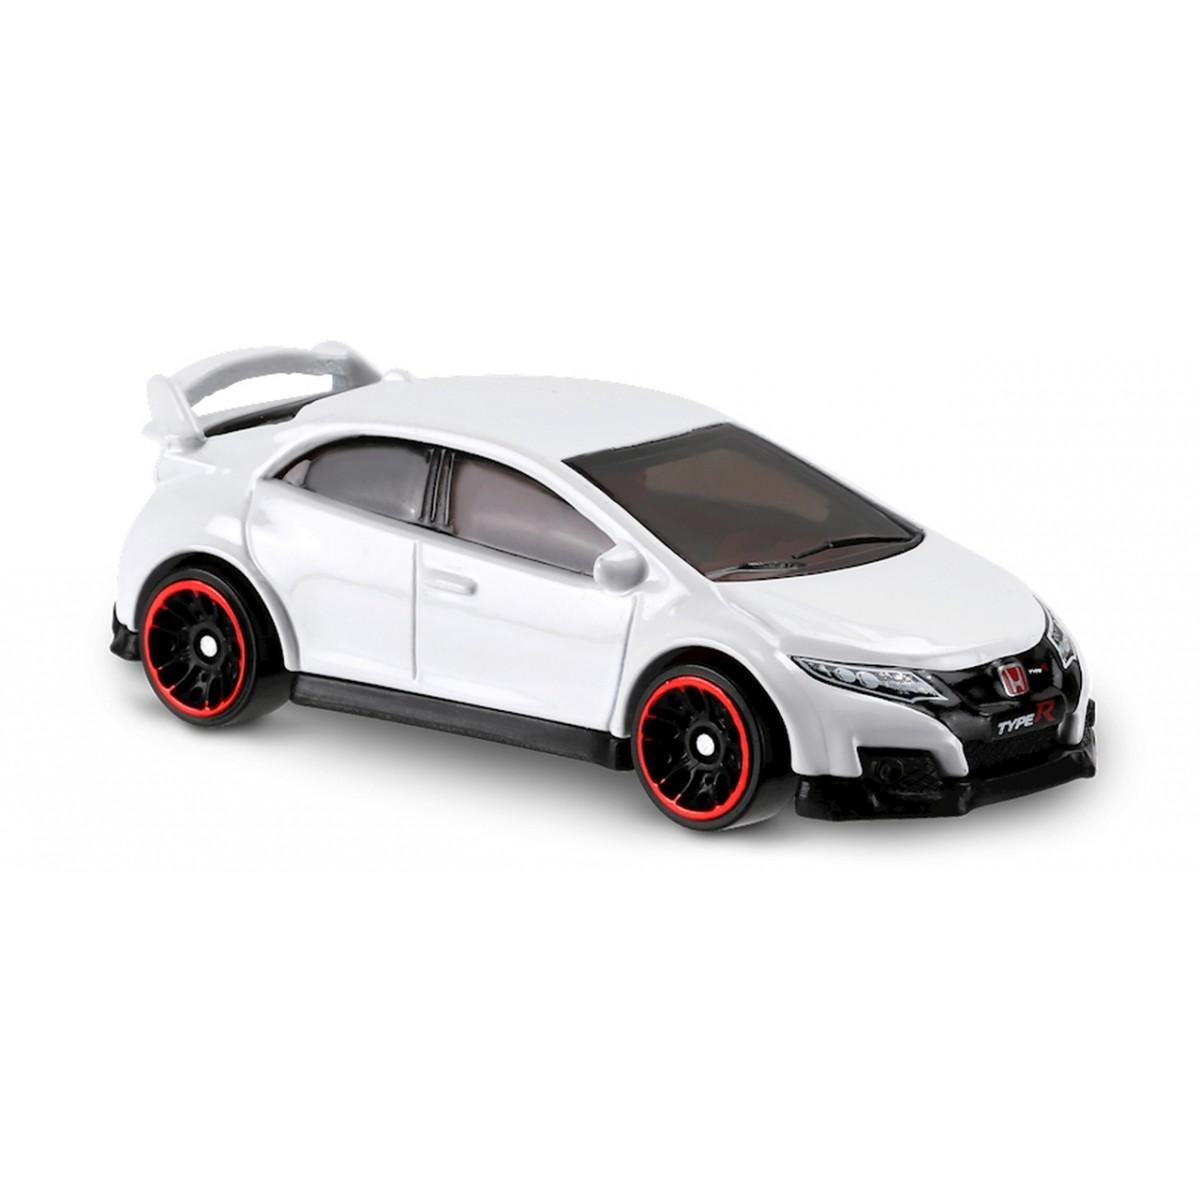 Carrinho Hot Wheels: '16 Honda Civic Type R Branco